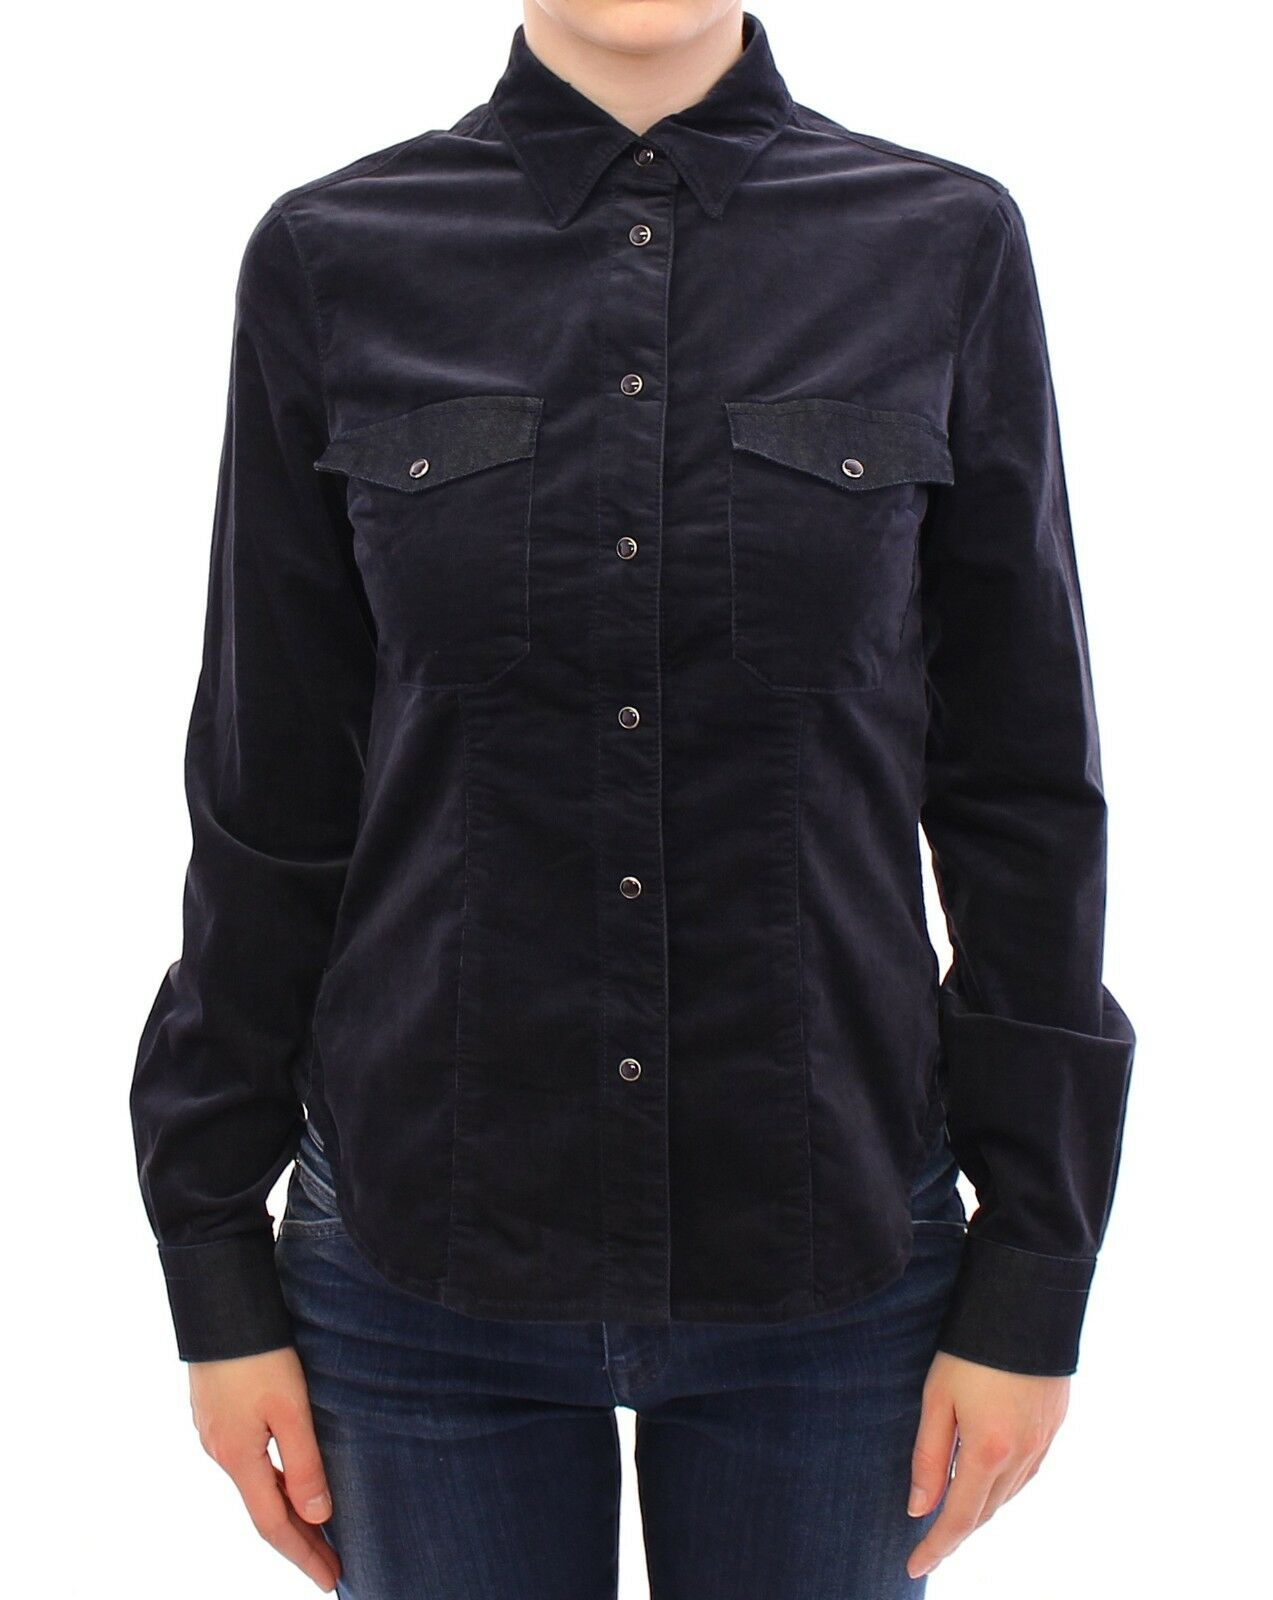 NEW  ARMANI JEANS AJ Shirt Blau Stretch Button Down Blouse Top IT40   US S